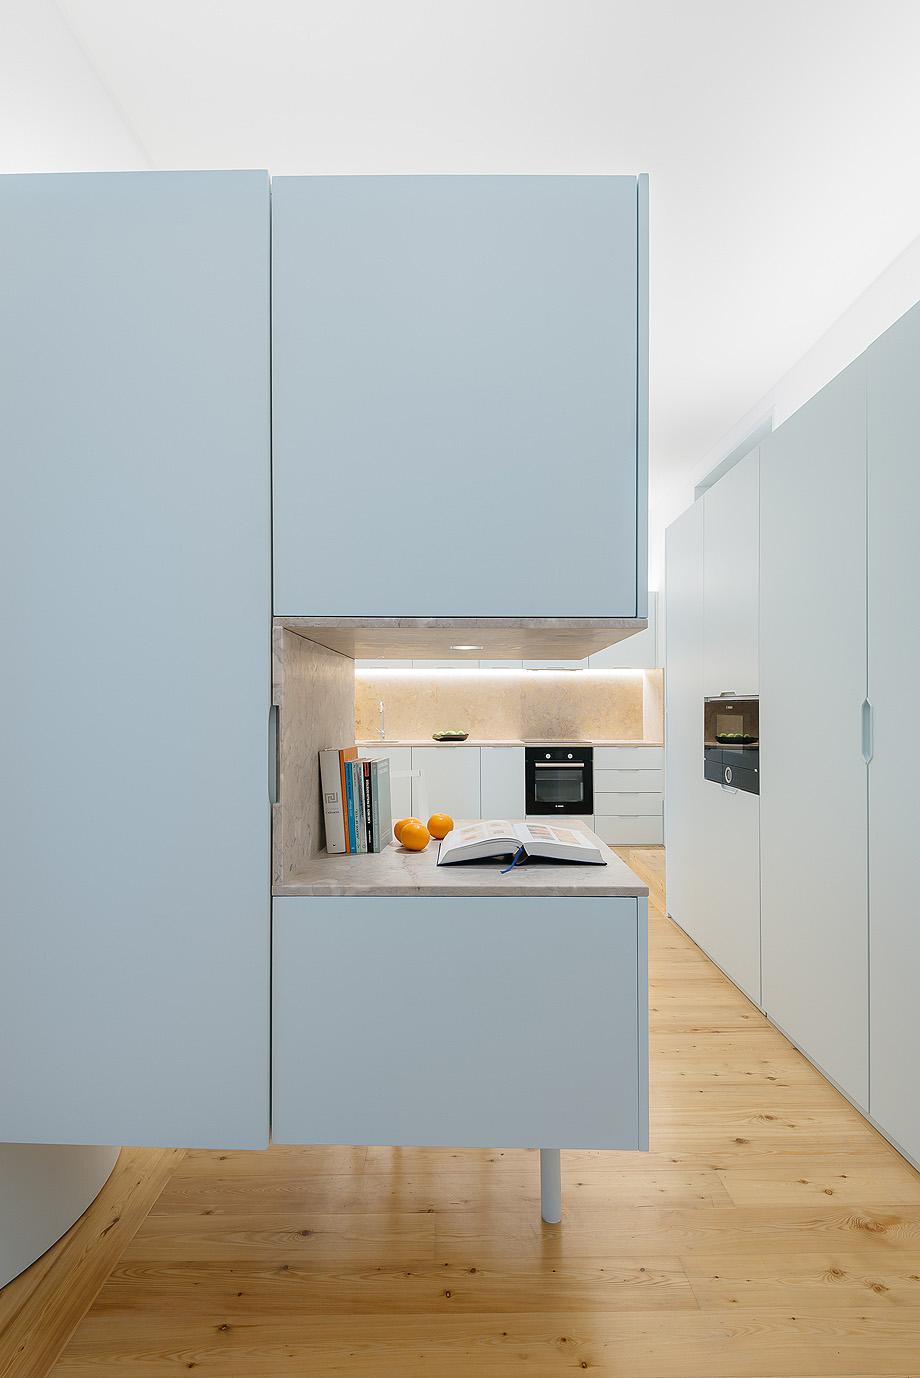 apartamentos pombalinos de aurora arquitectos - foto do mal o menos (25)